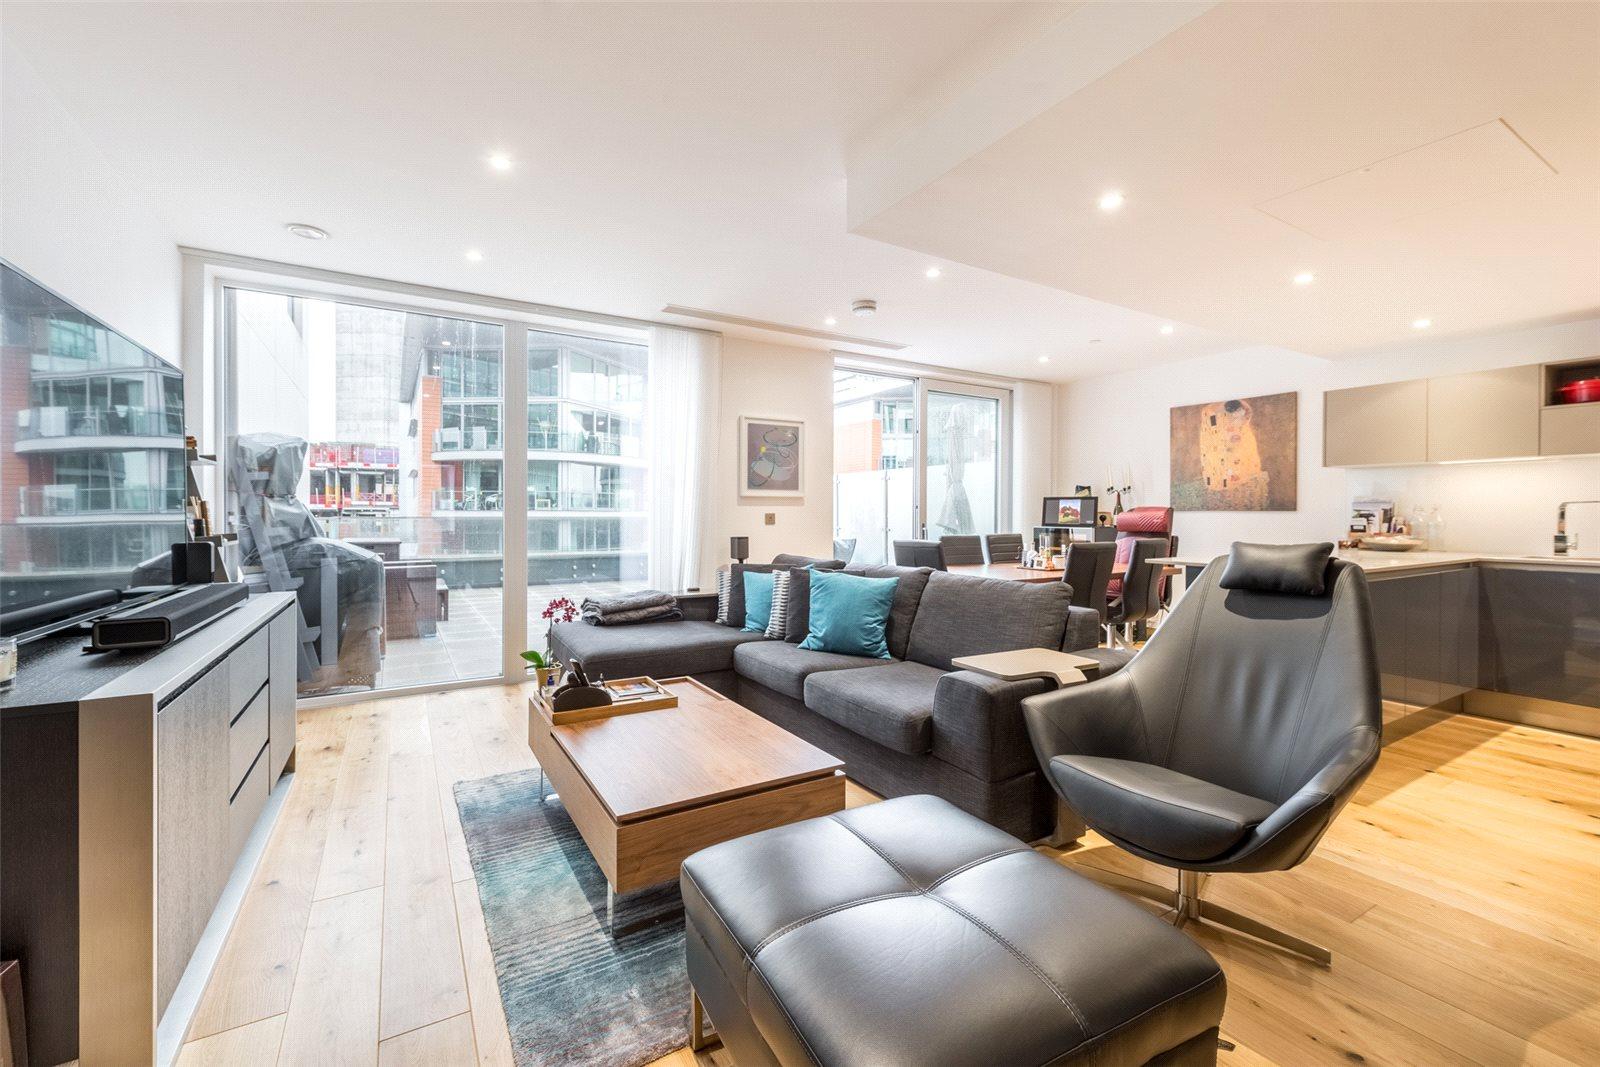 3 Bedrooms Apartment Flat for sale in Paddington Exchange, Paddington Basin, London, W2